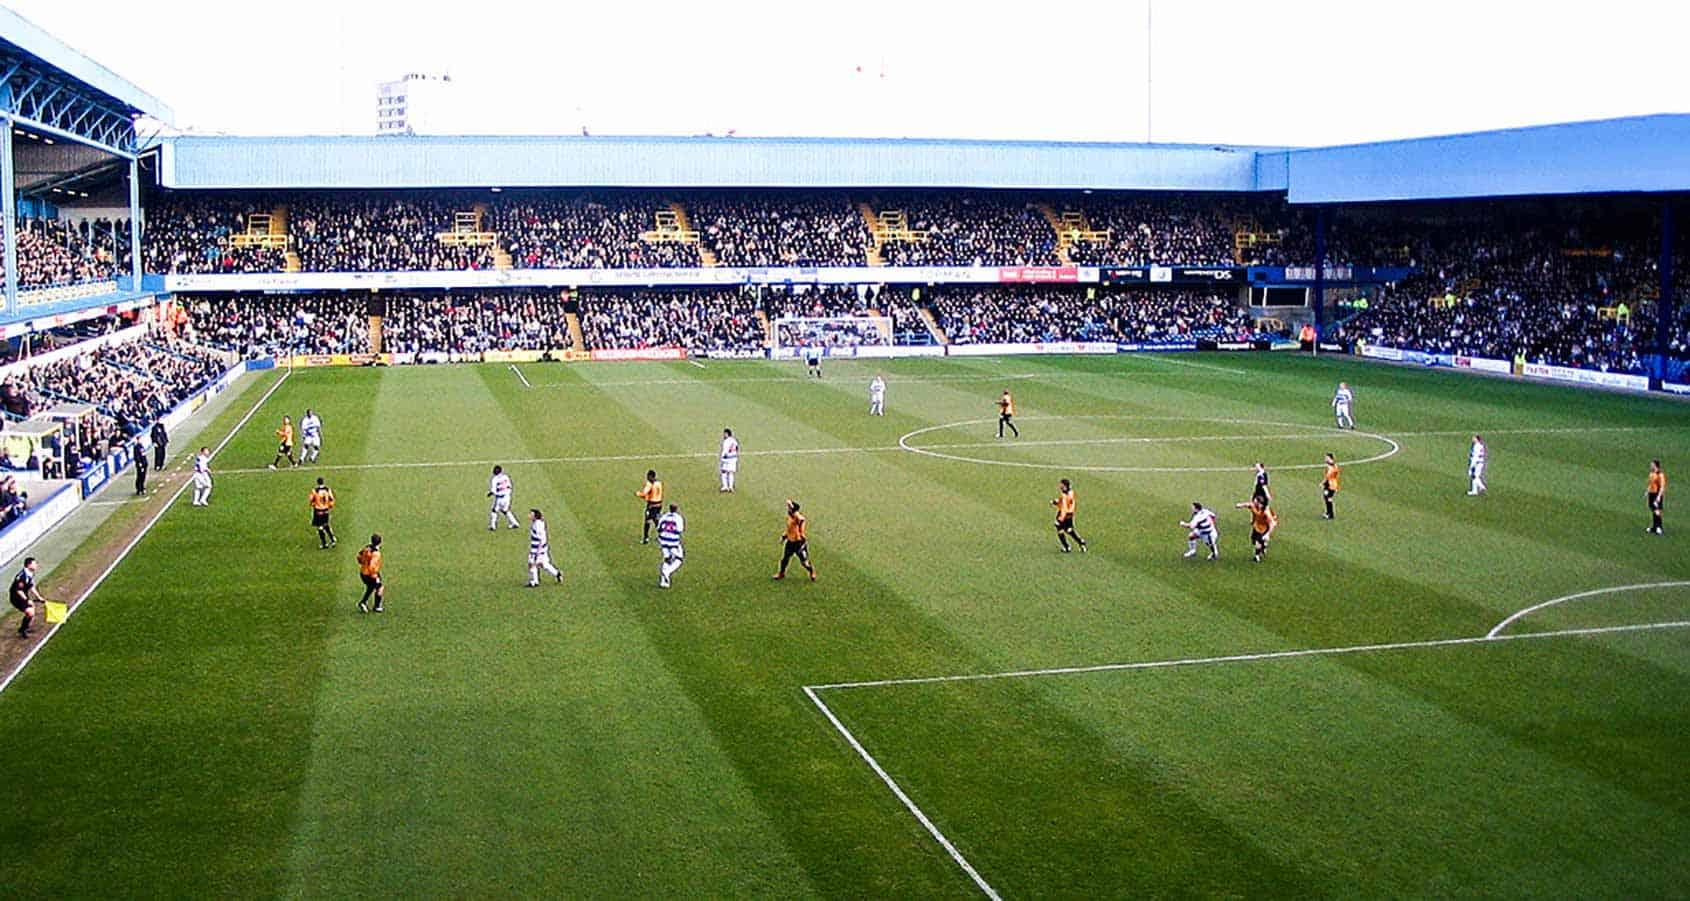 Fotbollsresor, Queens Park Rangers Biljetter, QPR, Championship, England, London, Loftus Road